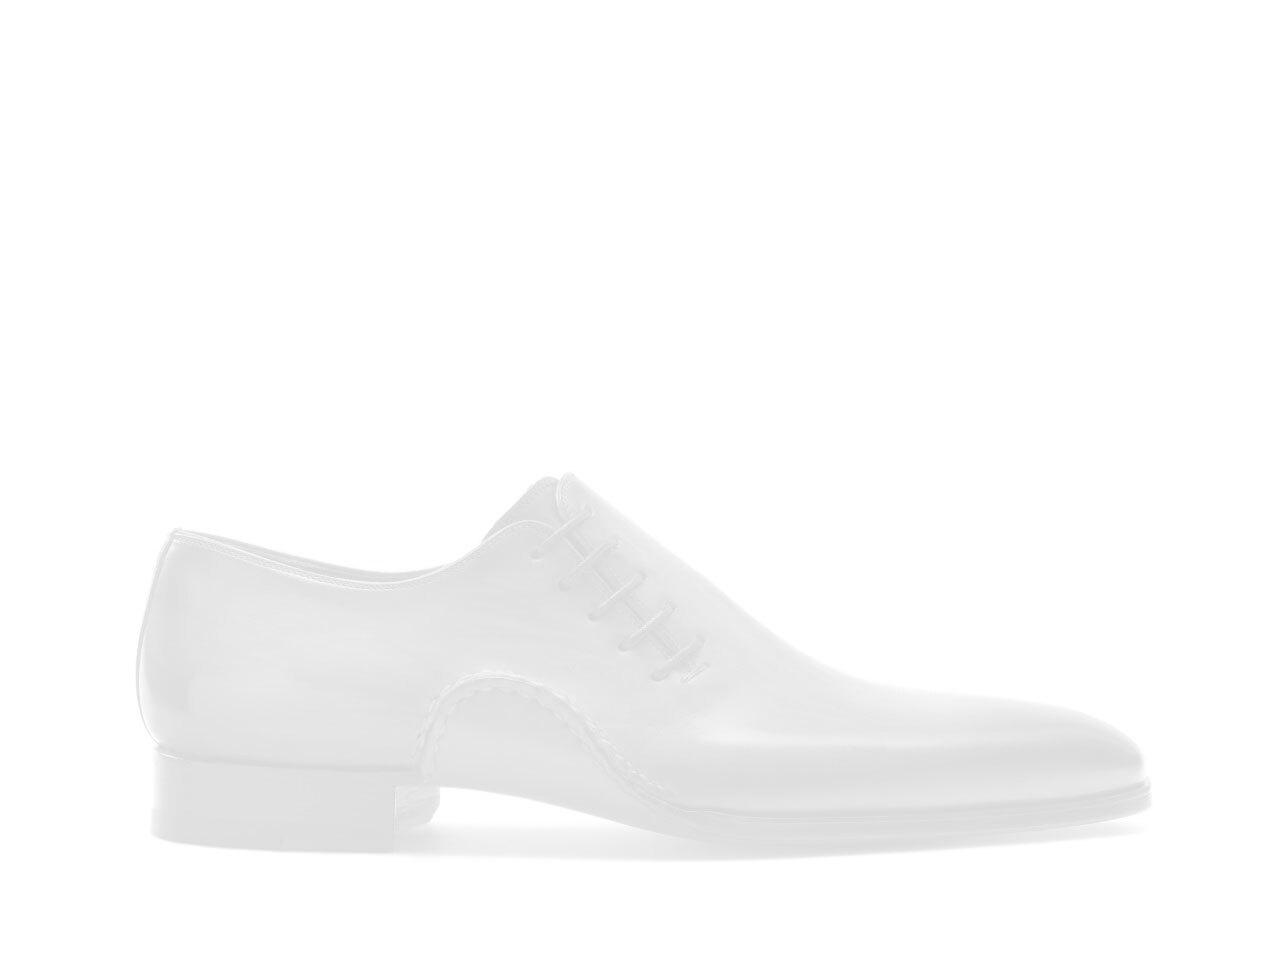 Side view of the Magnanni Ecija Black Men's Sneakers